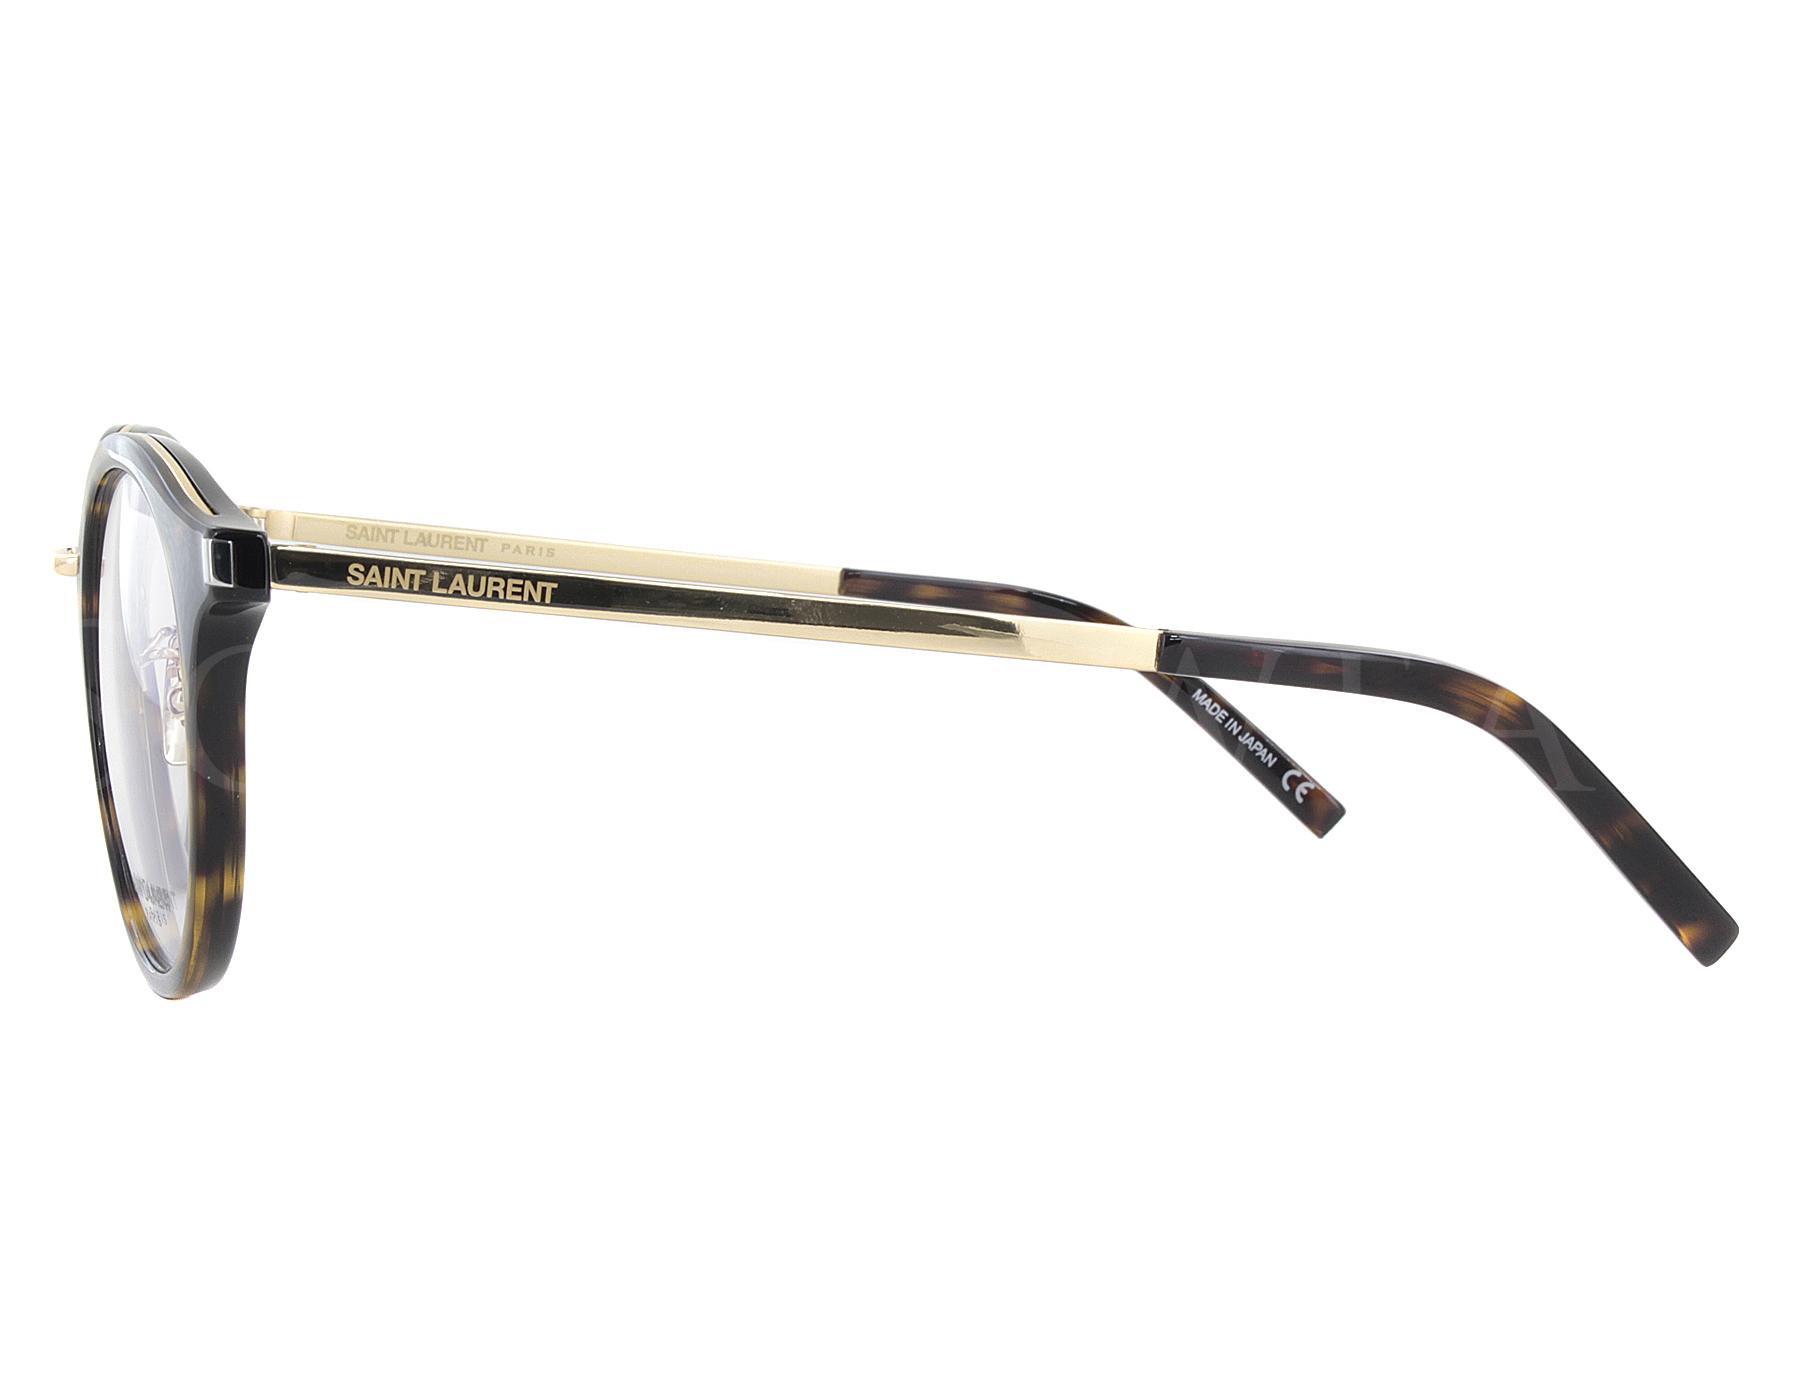 a5eaadb85a NEW Yves Saint Laurent SL91 007 49mm Gold Optical Eyeglasses Frames ...